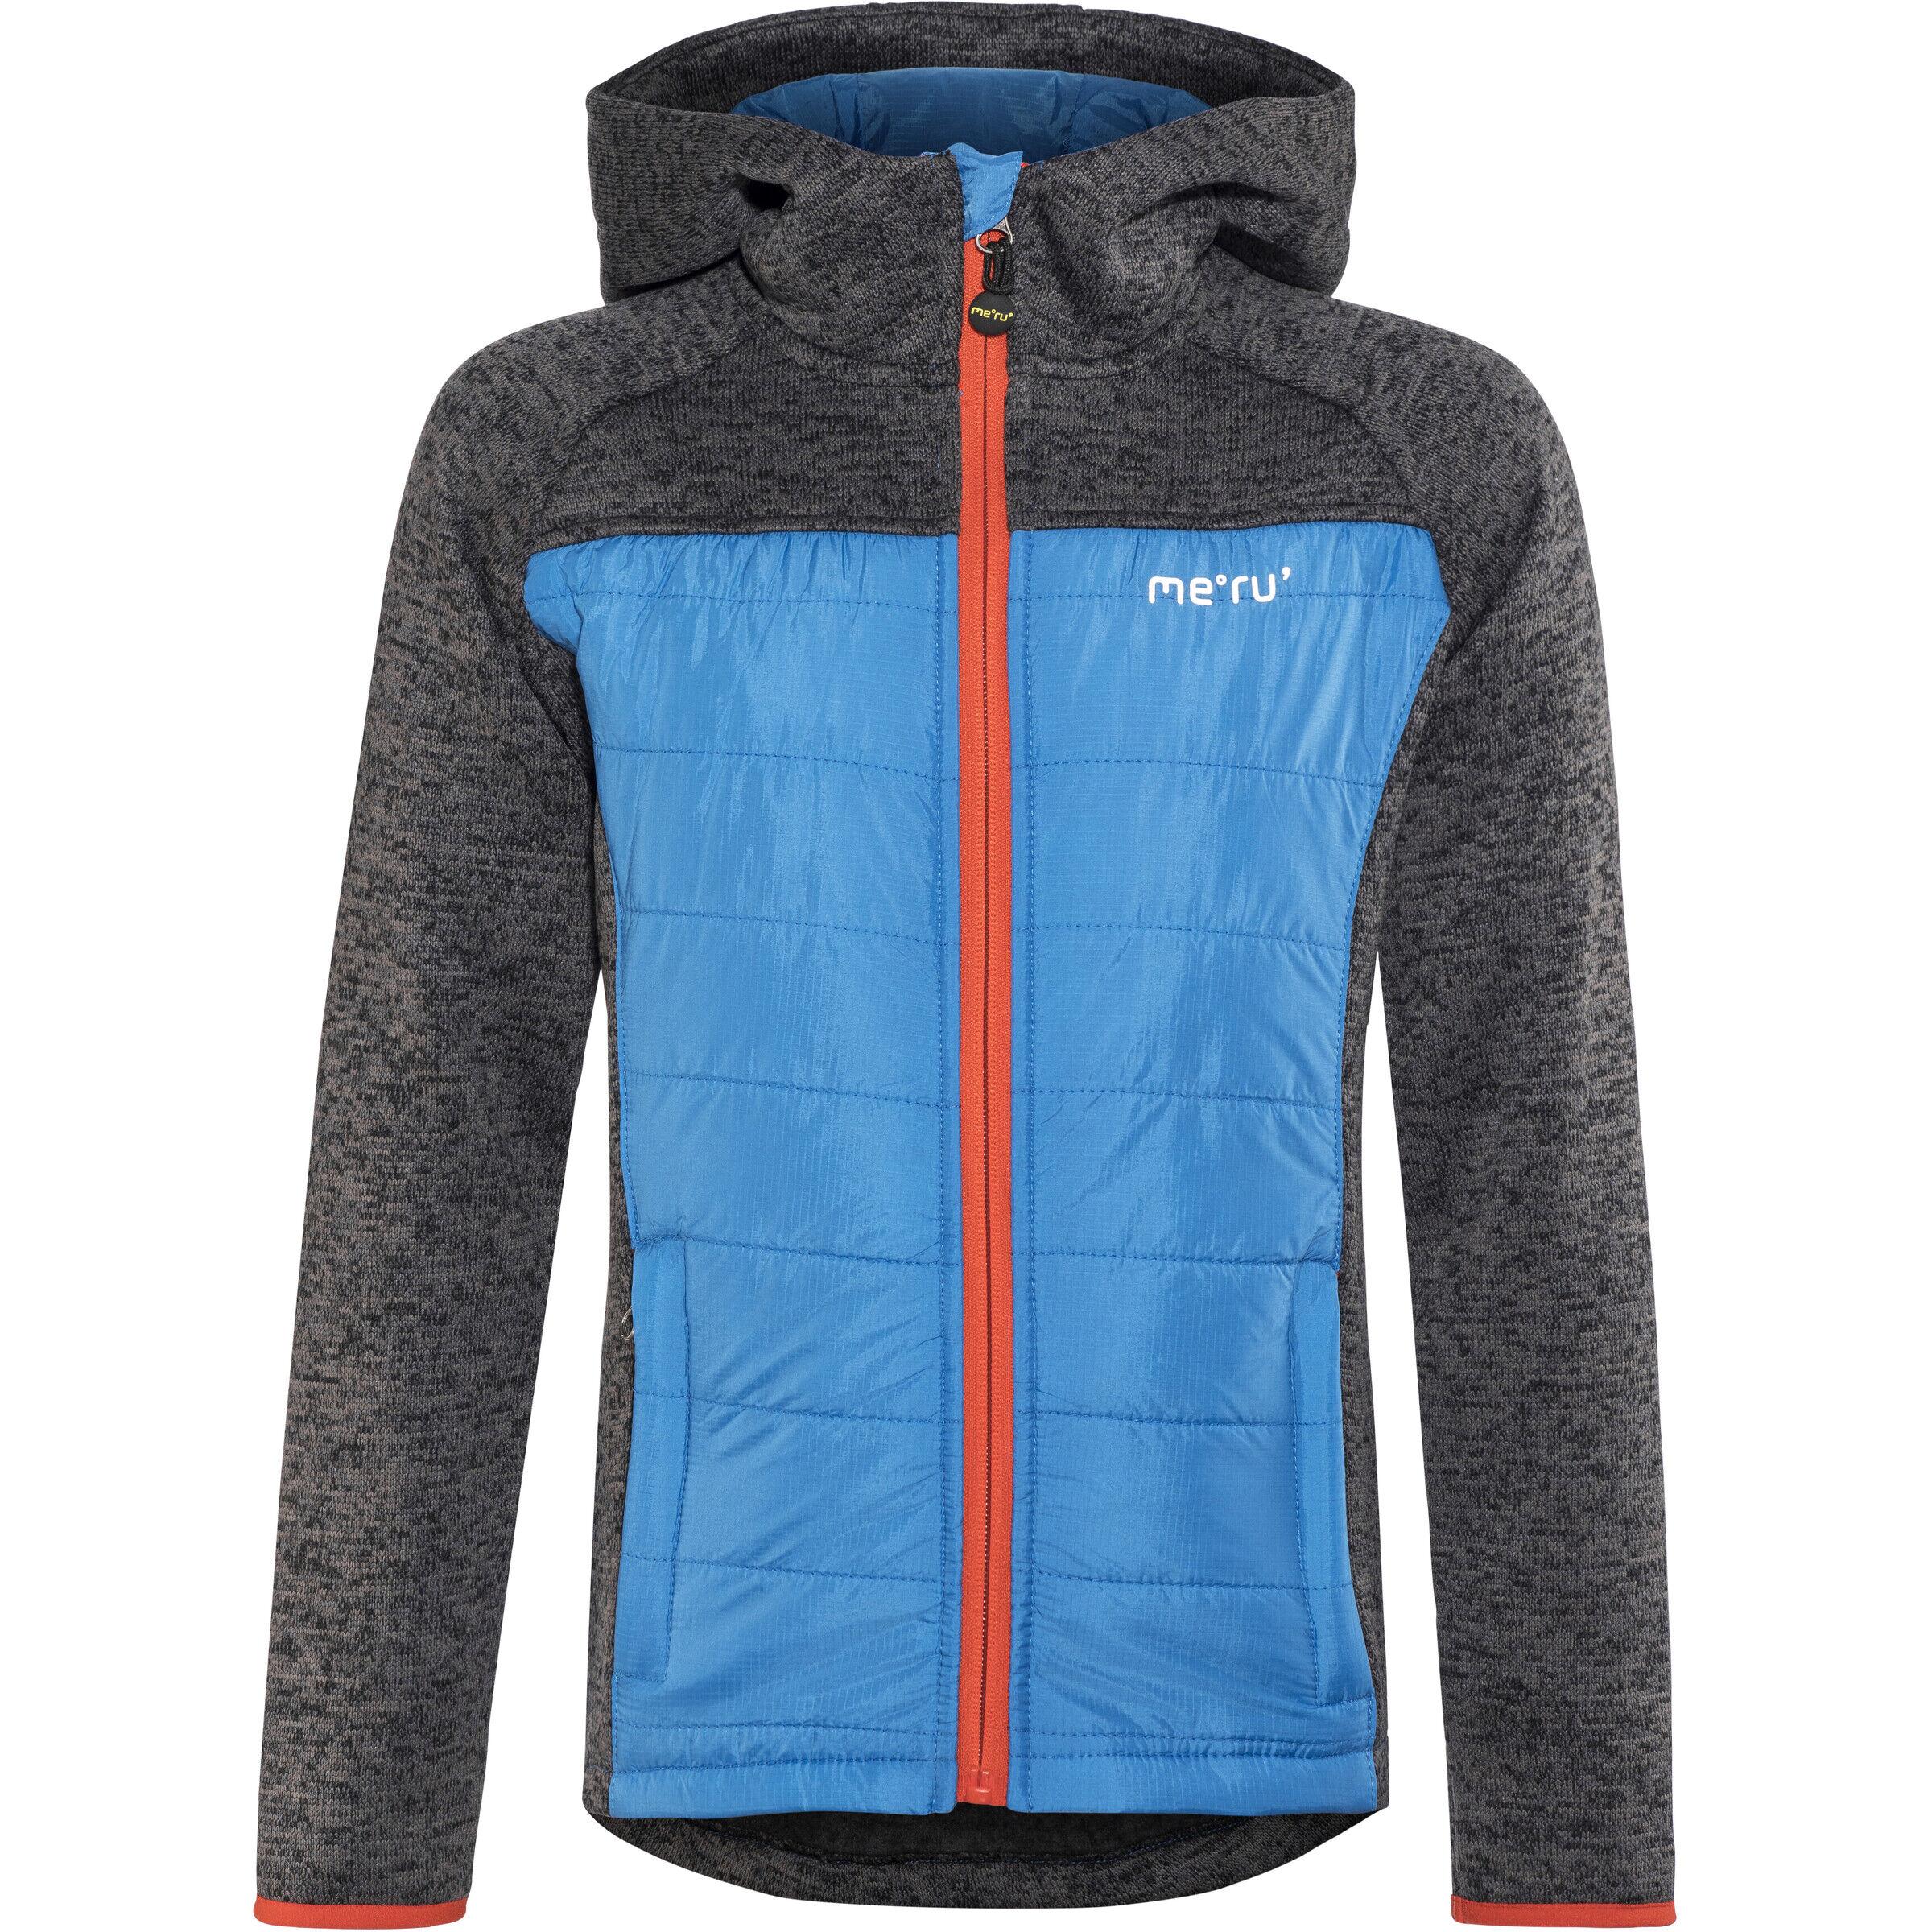 meru kinder outdoor jacke fleece